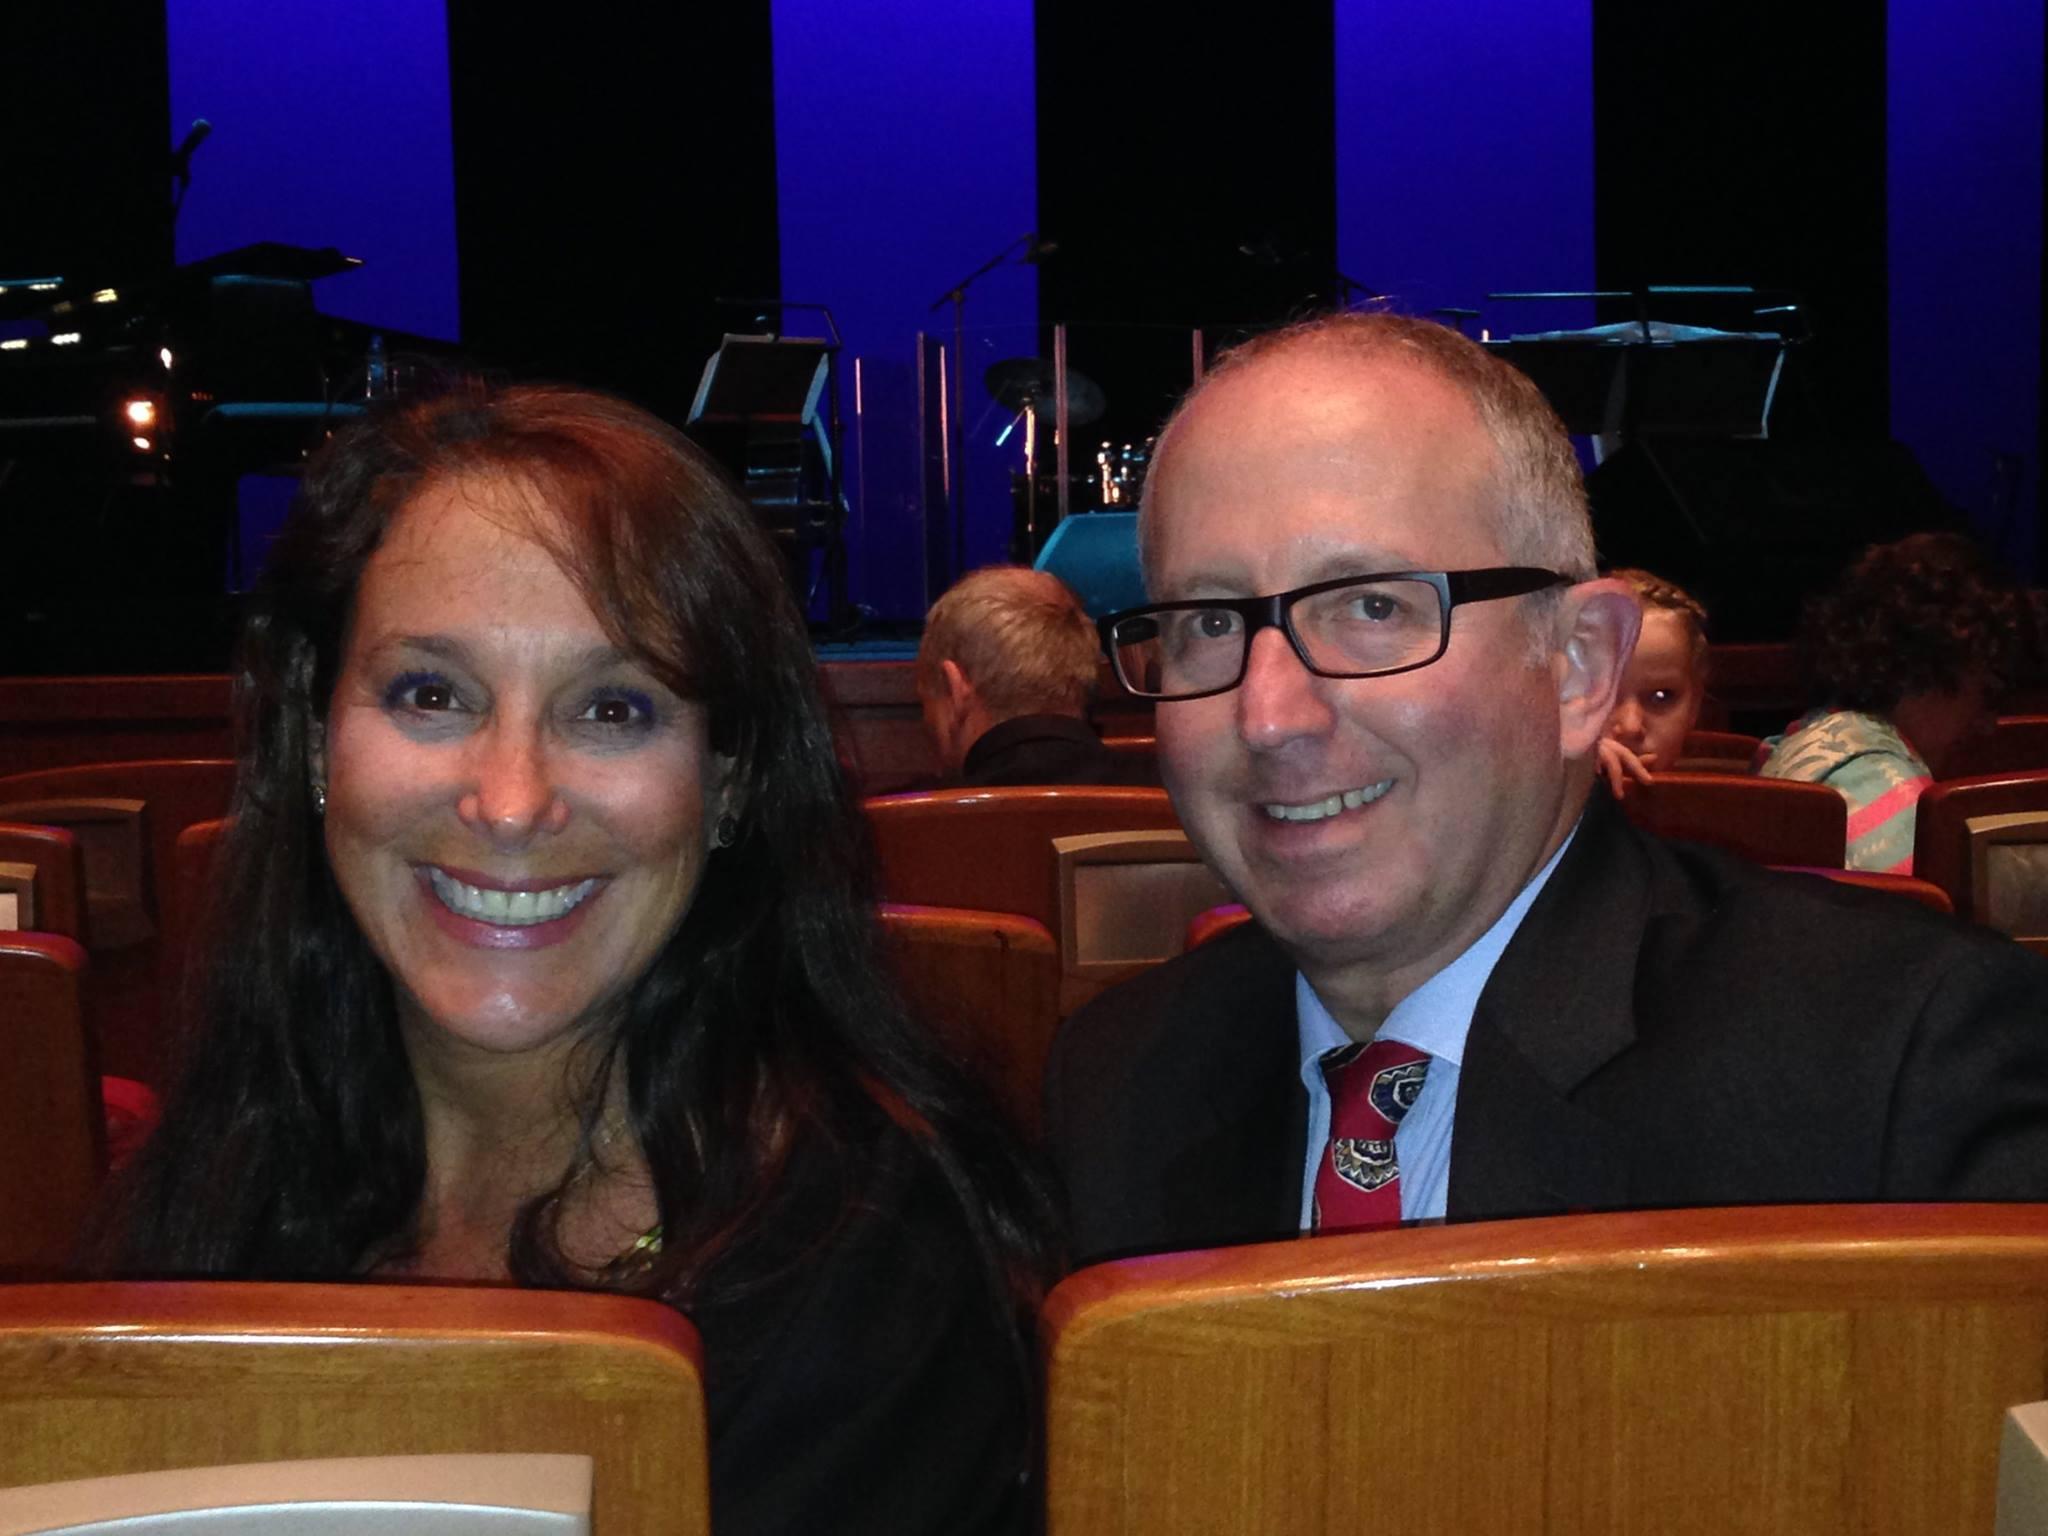 Denise & Mark at Royal Opera Muscat, Oman